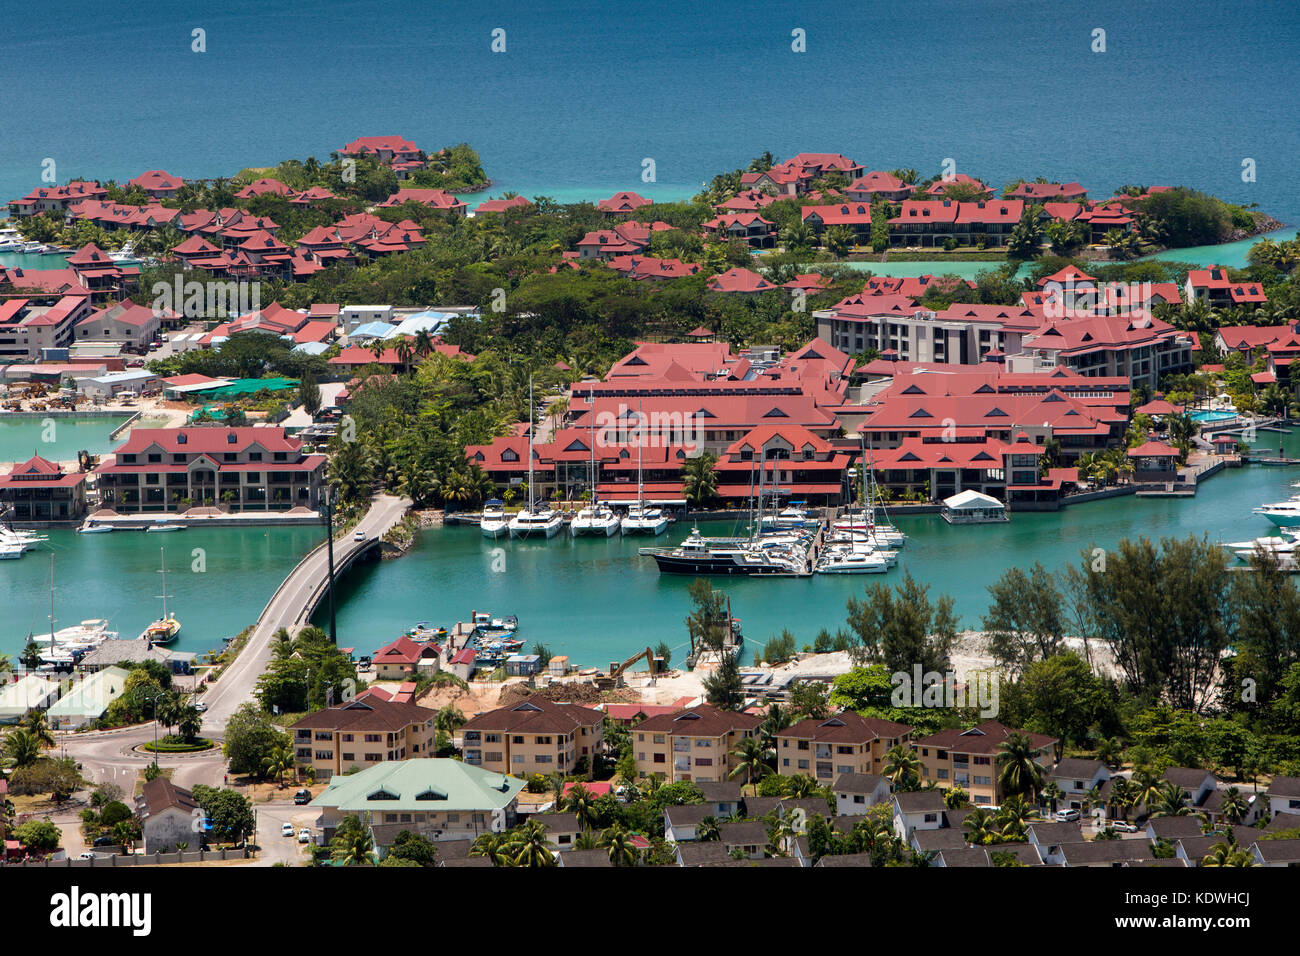 The Seychelles, Mahe, Victoria, Eden Island, residences & marina on reclaimed land - Stock Image